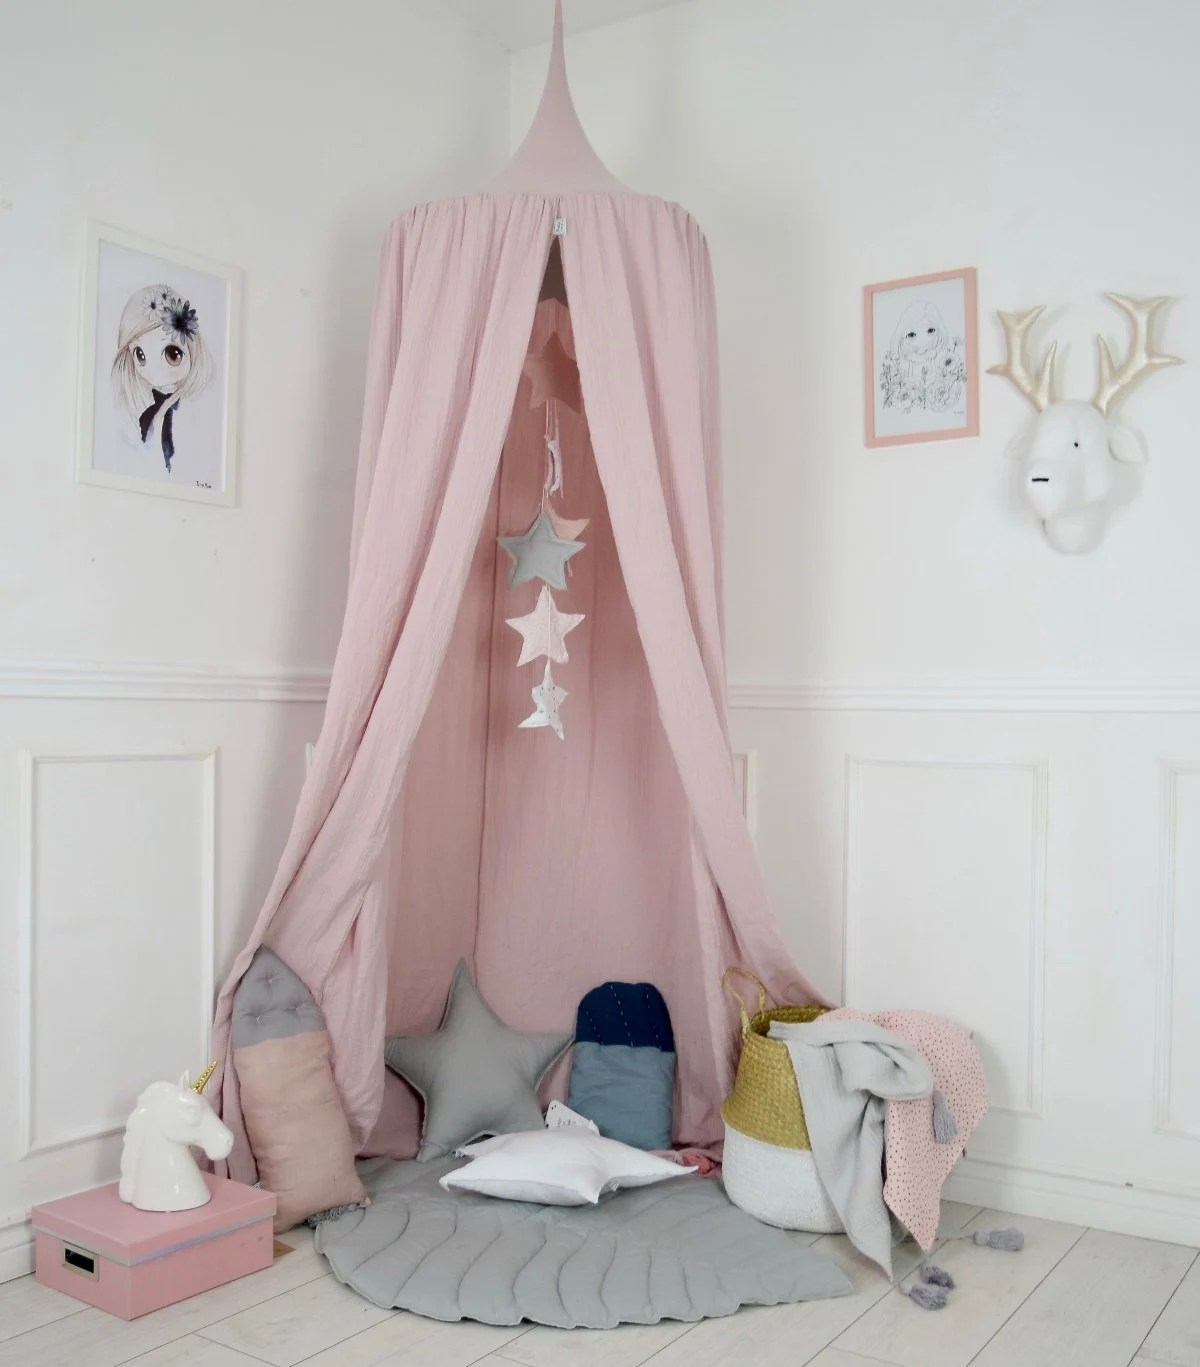 Kinderzimmer Zelt Zum Aufhängen